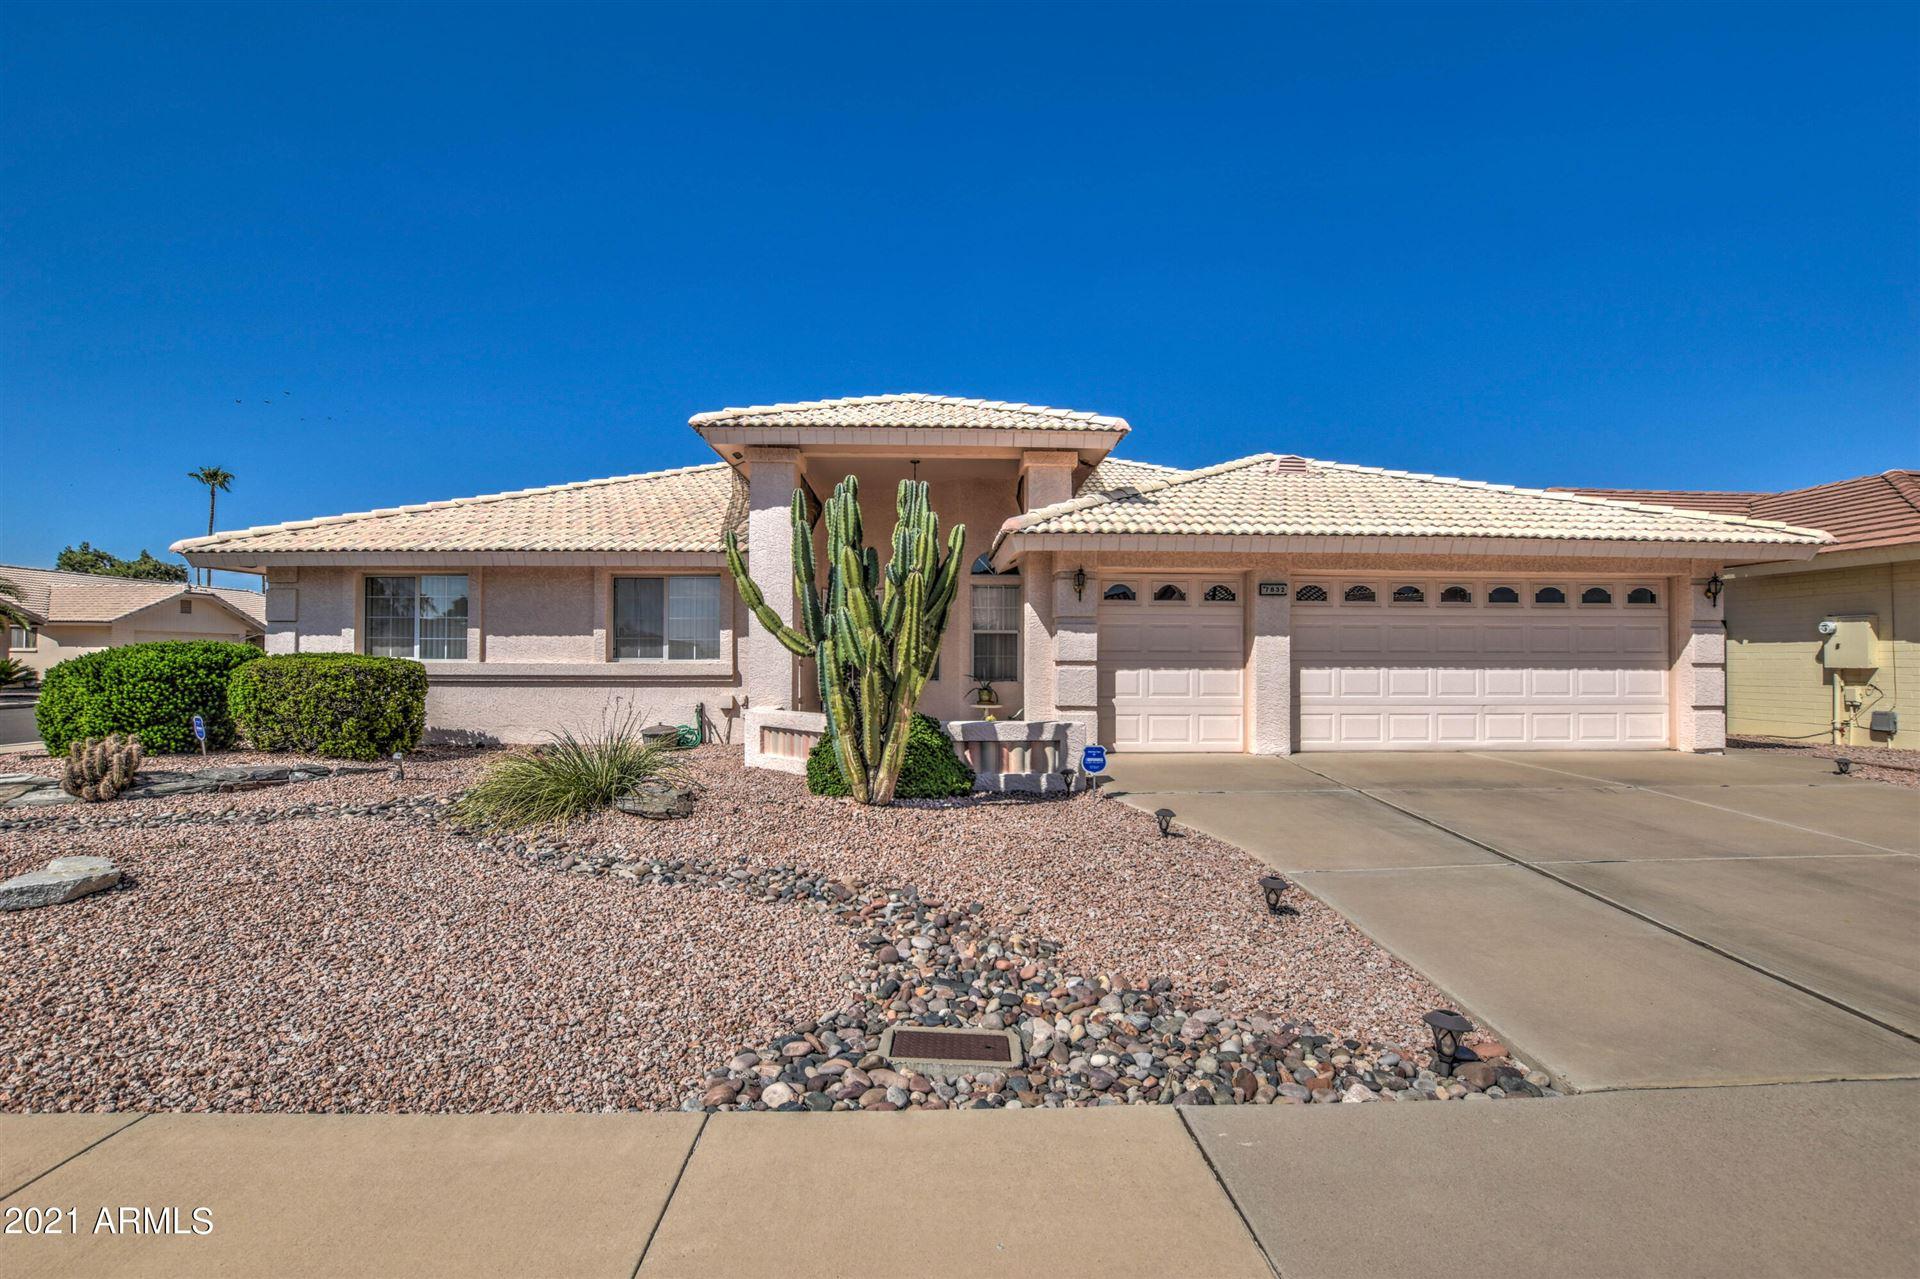 7832 E Monte Avenue, Mesa, AZ 85209 - #: 6298618